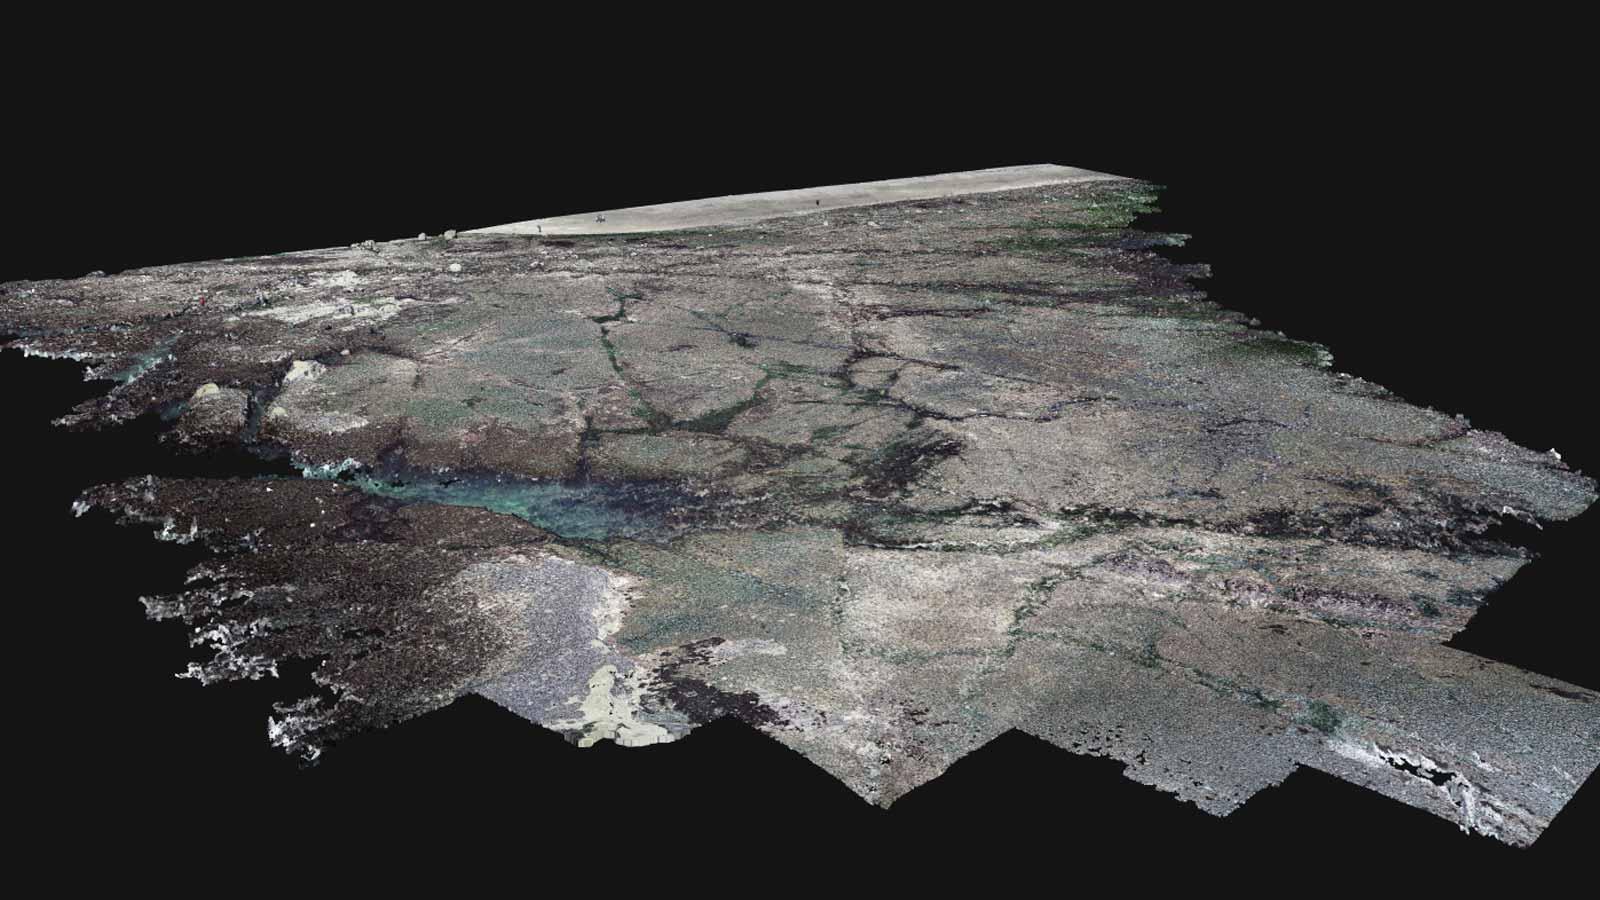 3d-model-of-a-rocky-coastline